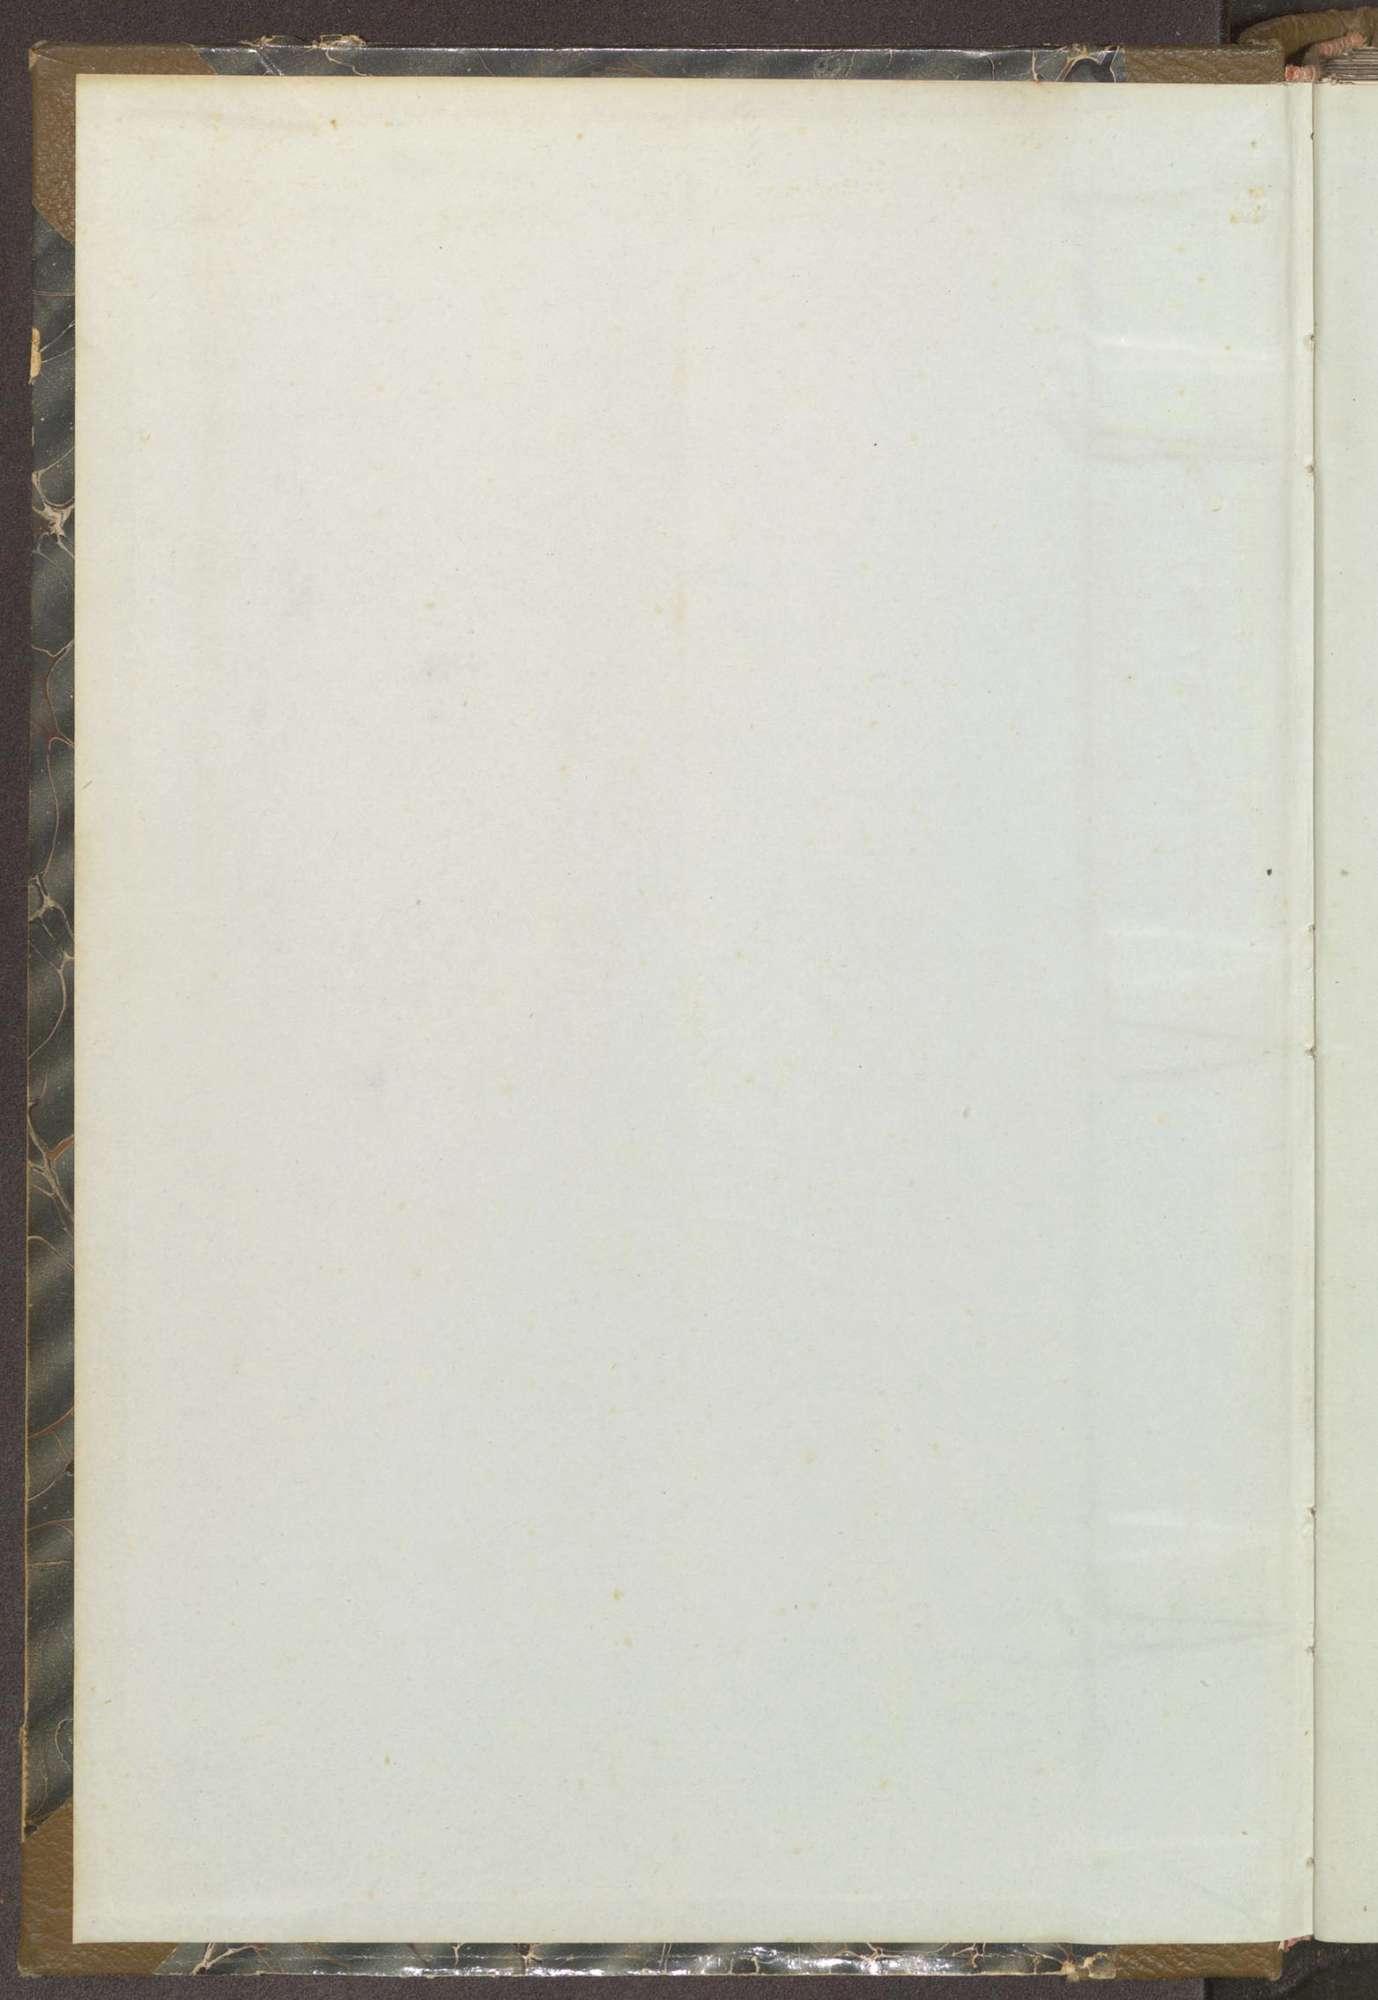 Geburtenregister Oberschmeien, Bild 2